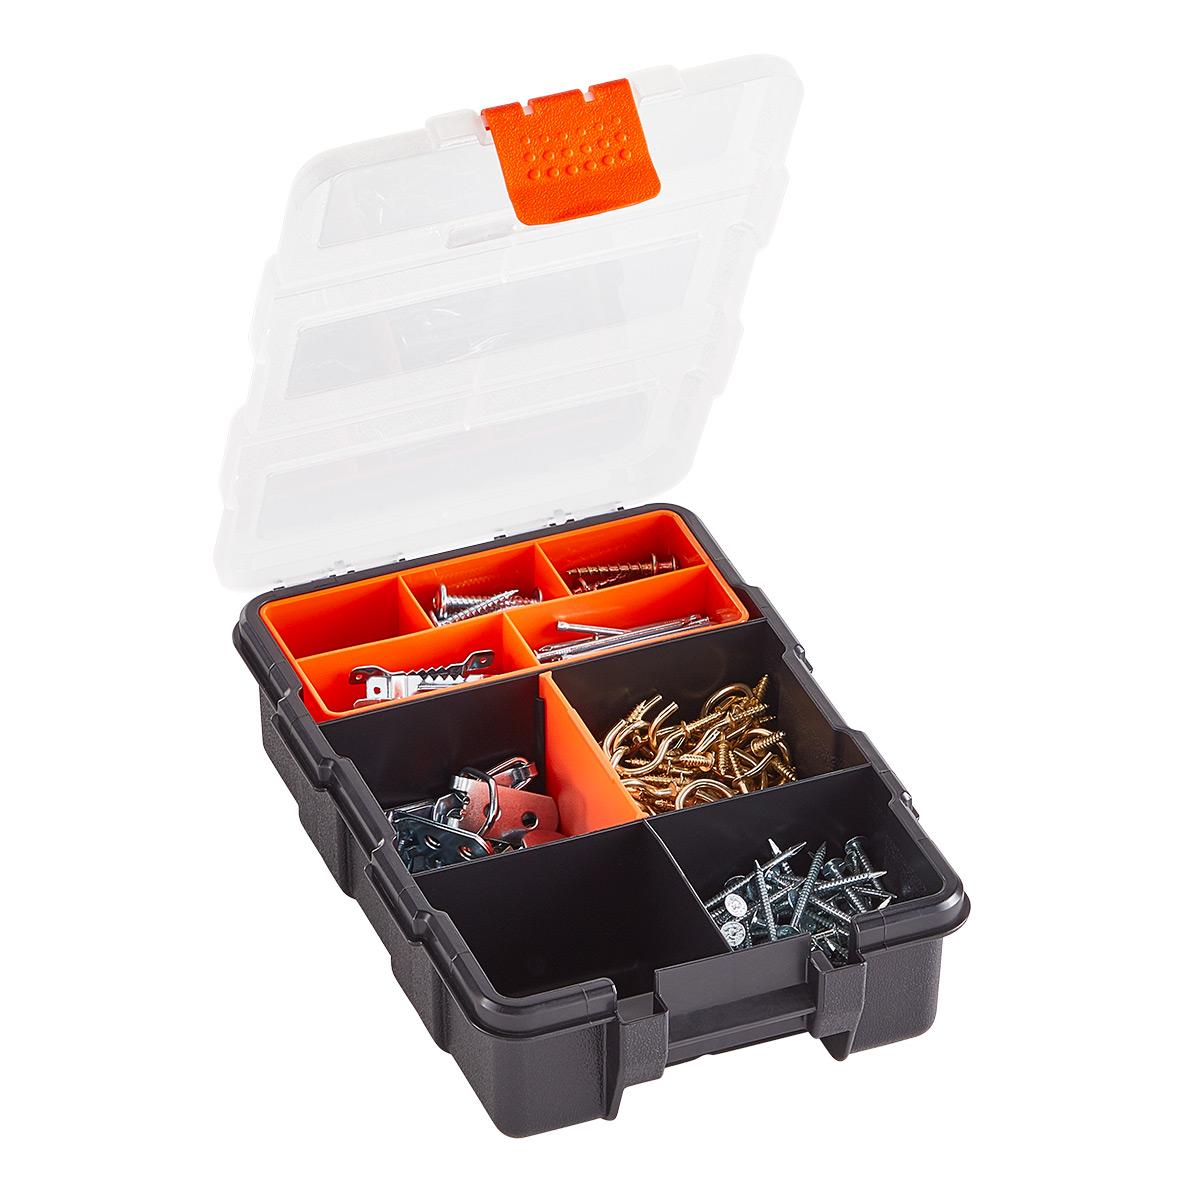 Stackable Parts Box